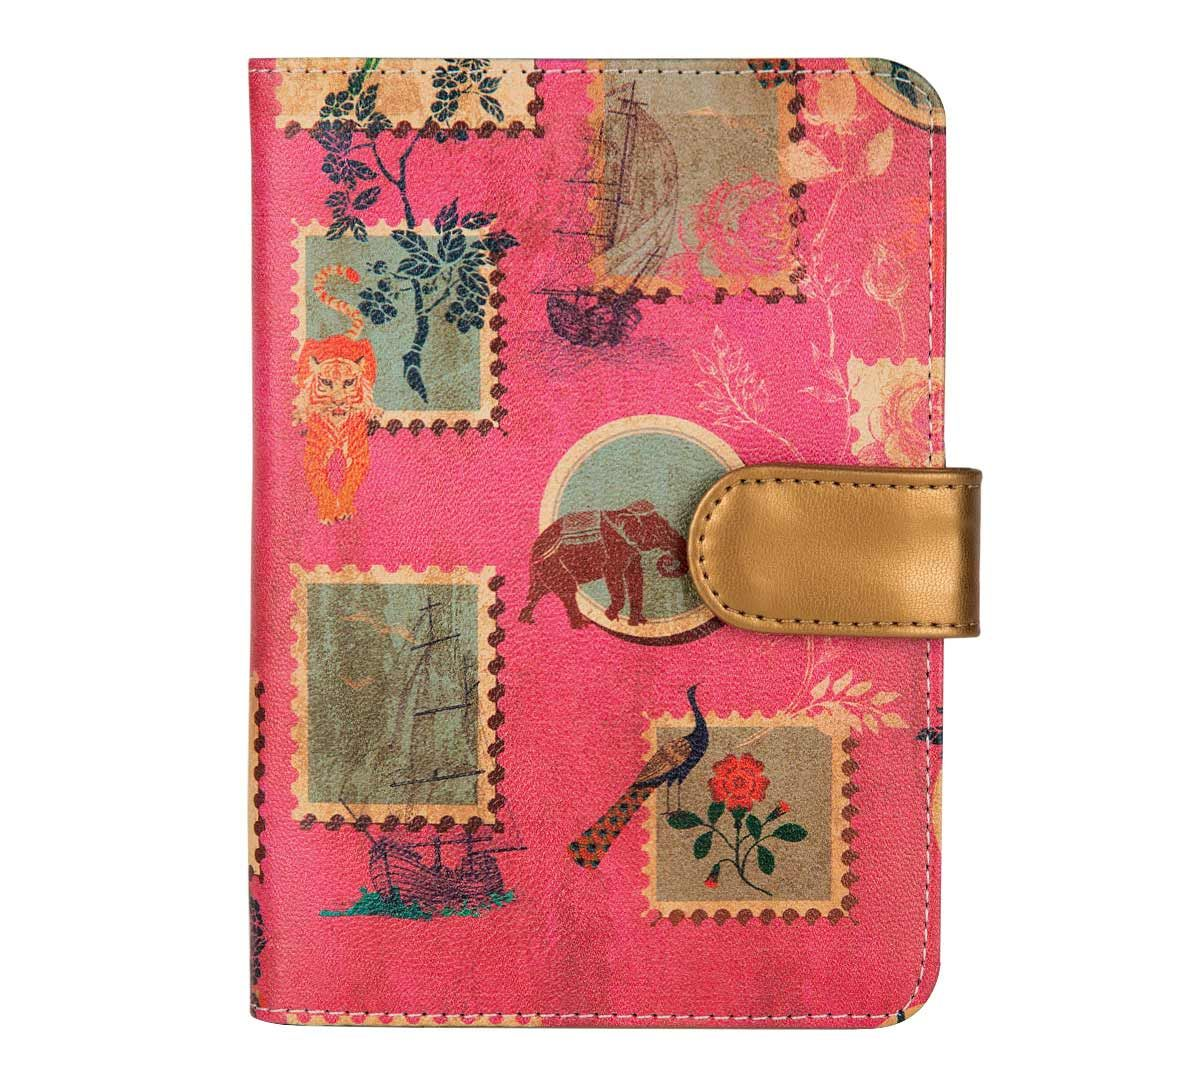 India Circus Wildlife Stamps Passport Cover